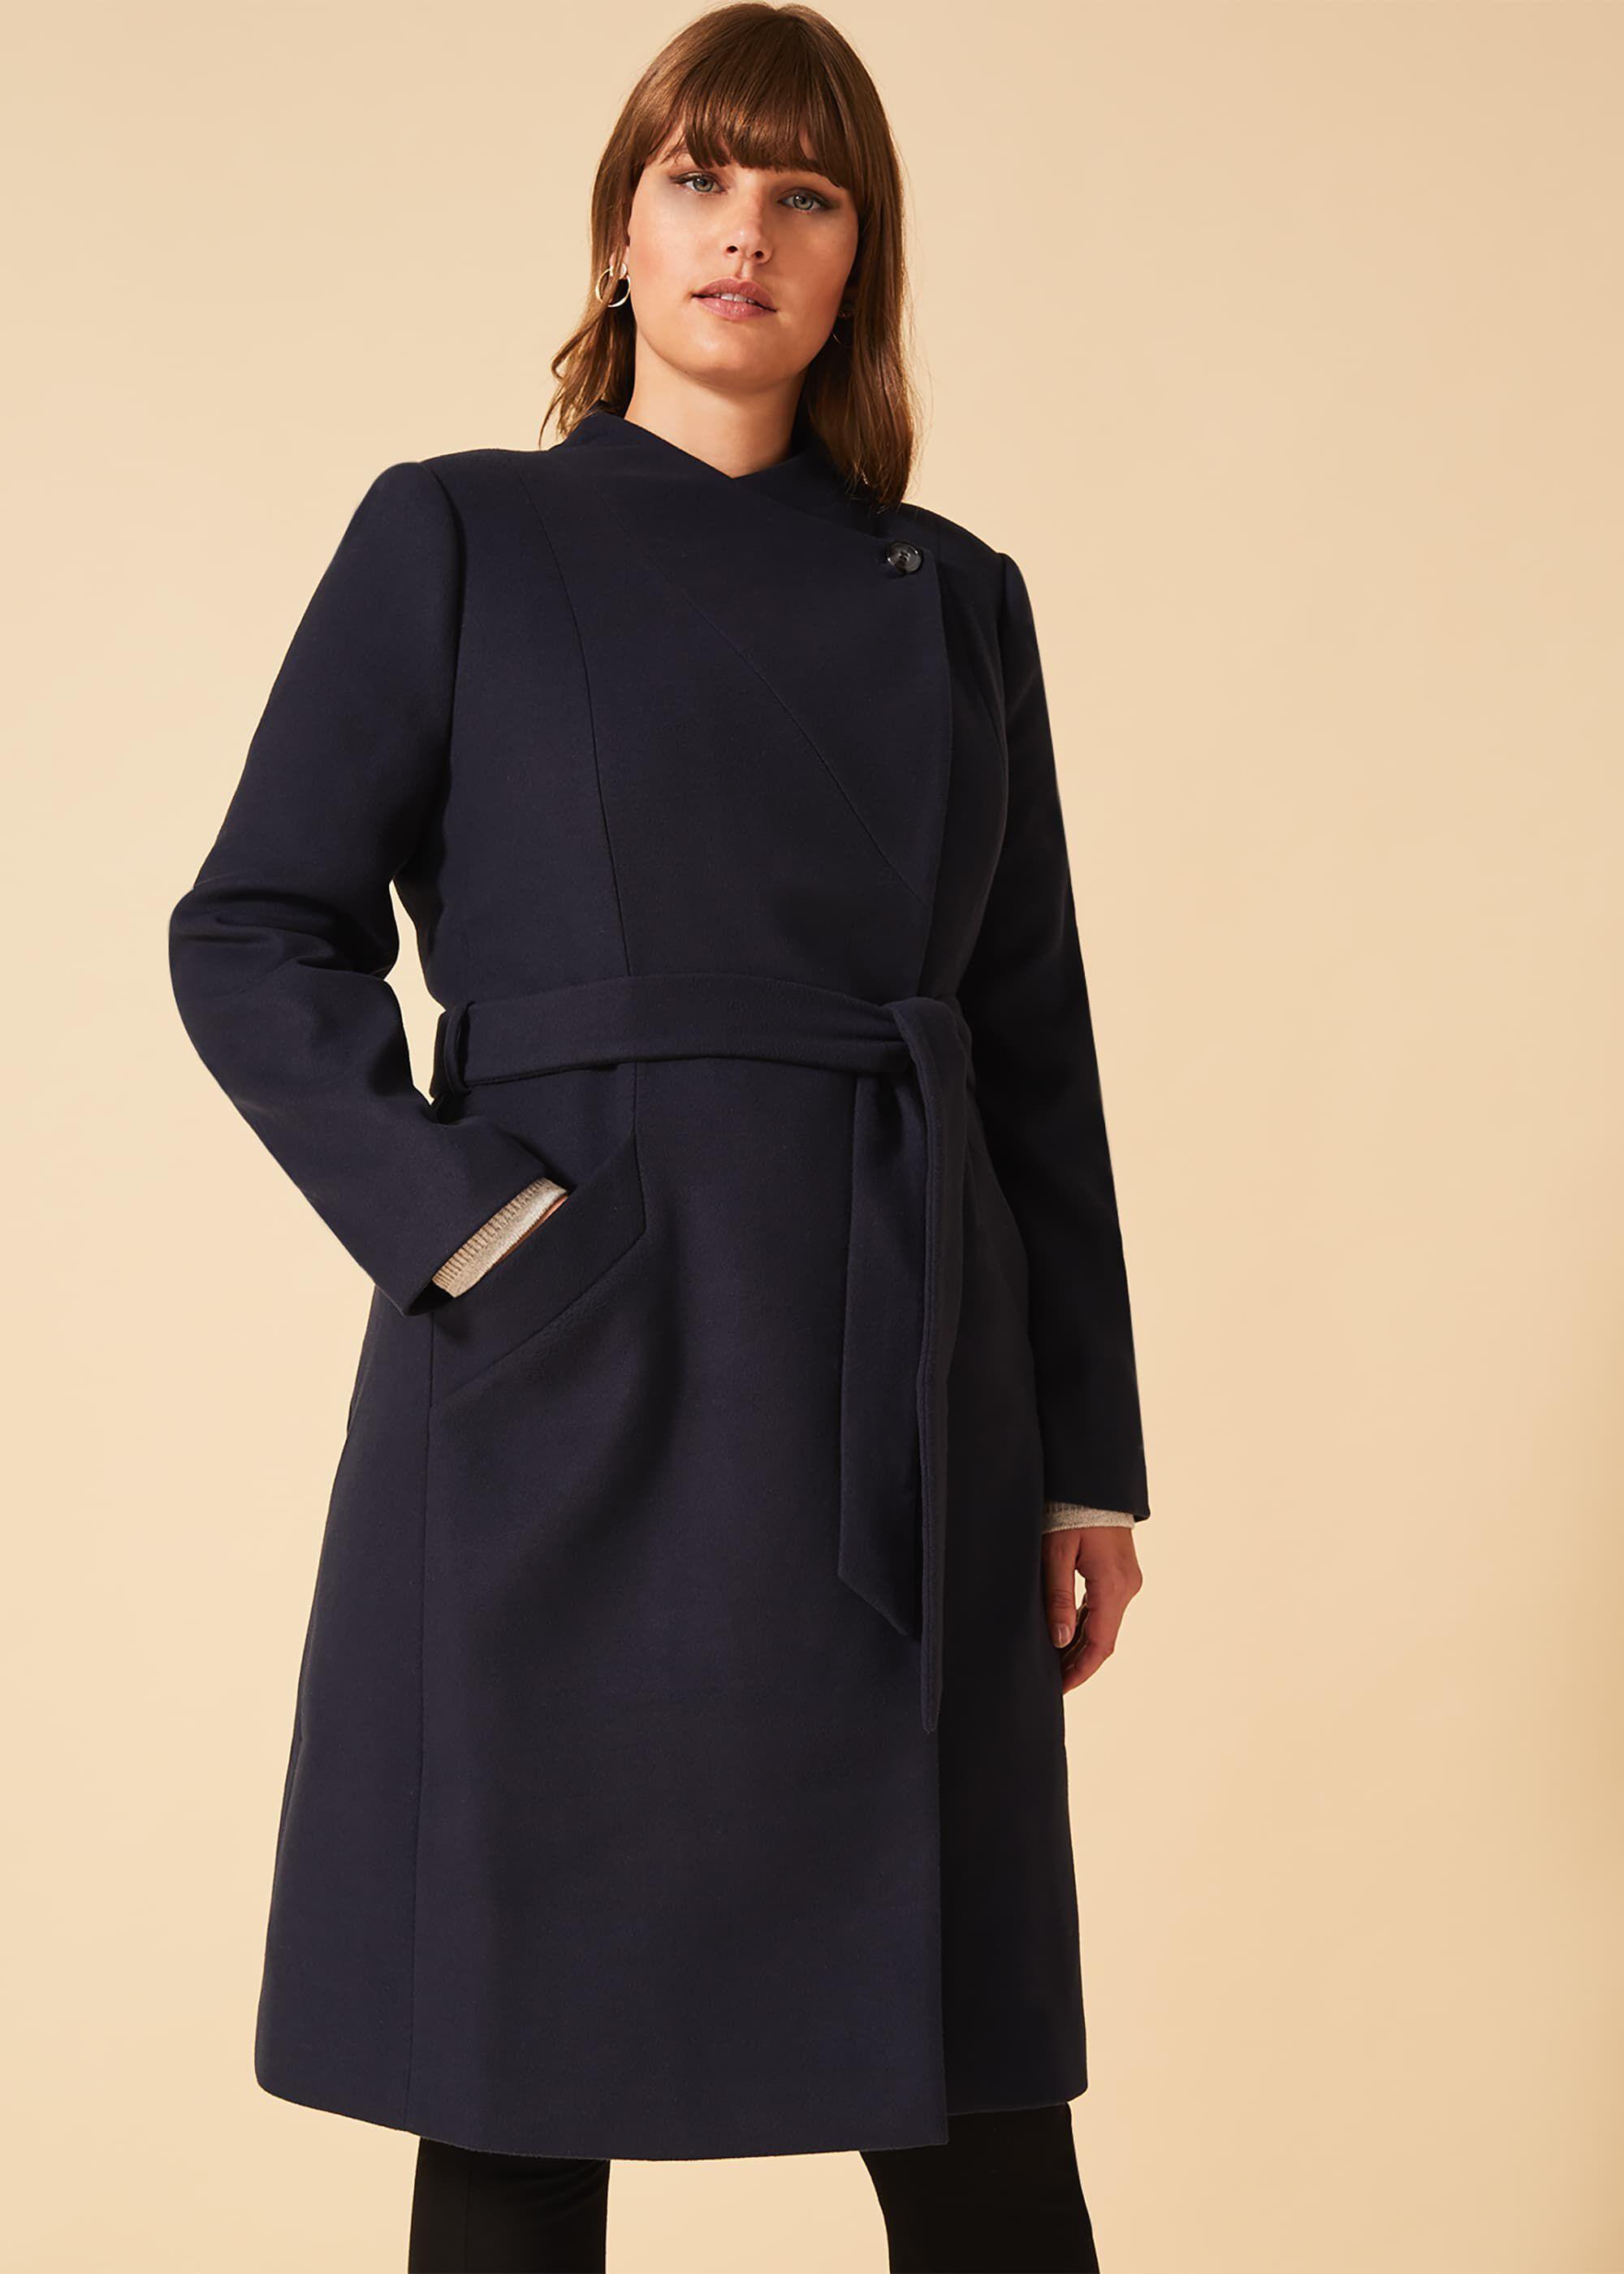 Susie Stand Up Collar Coat 4